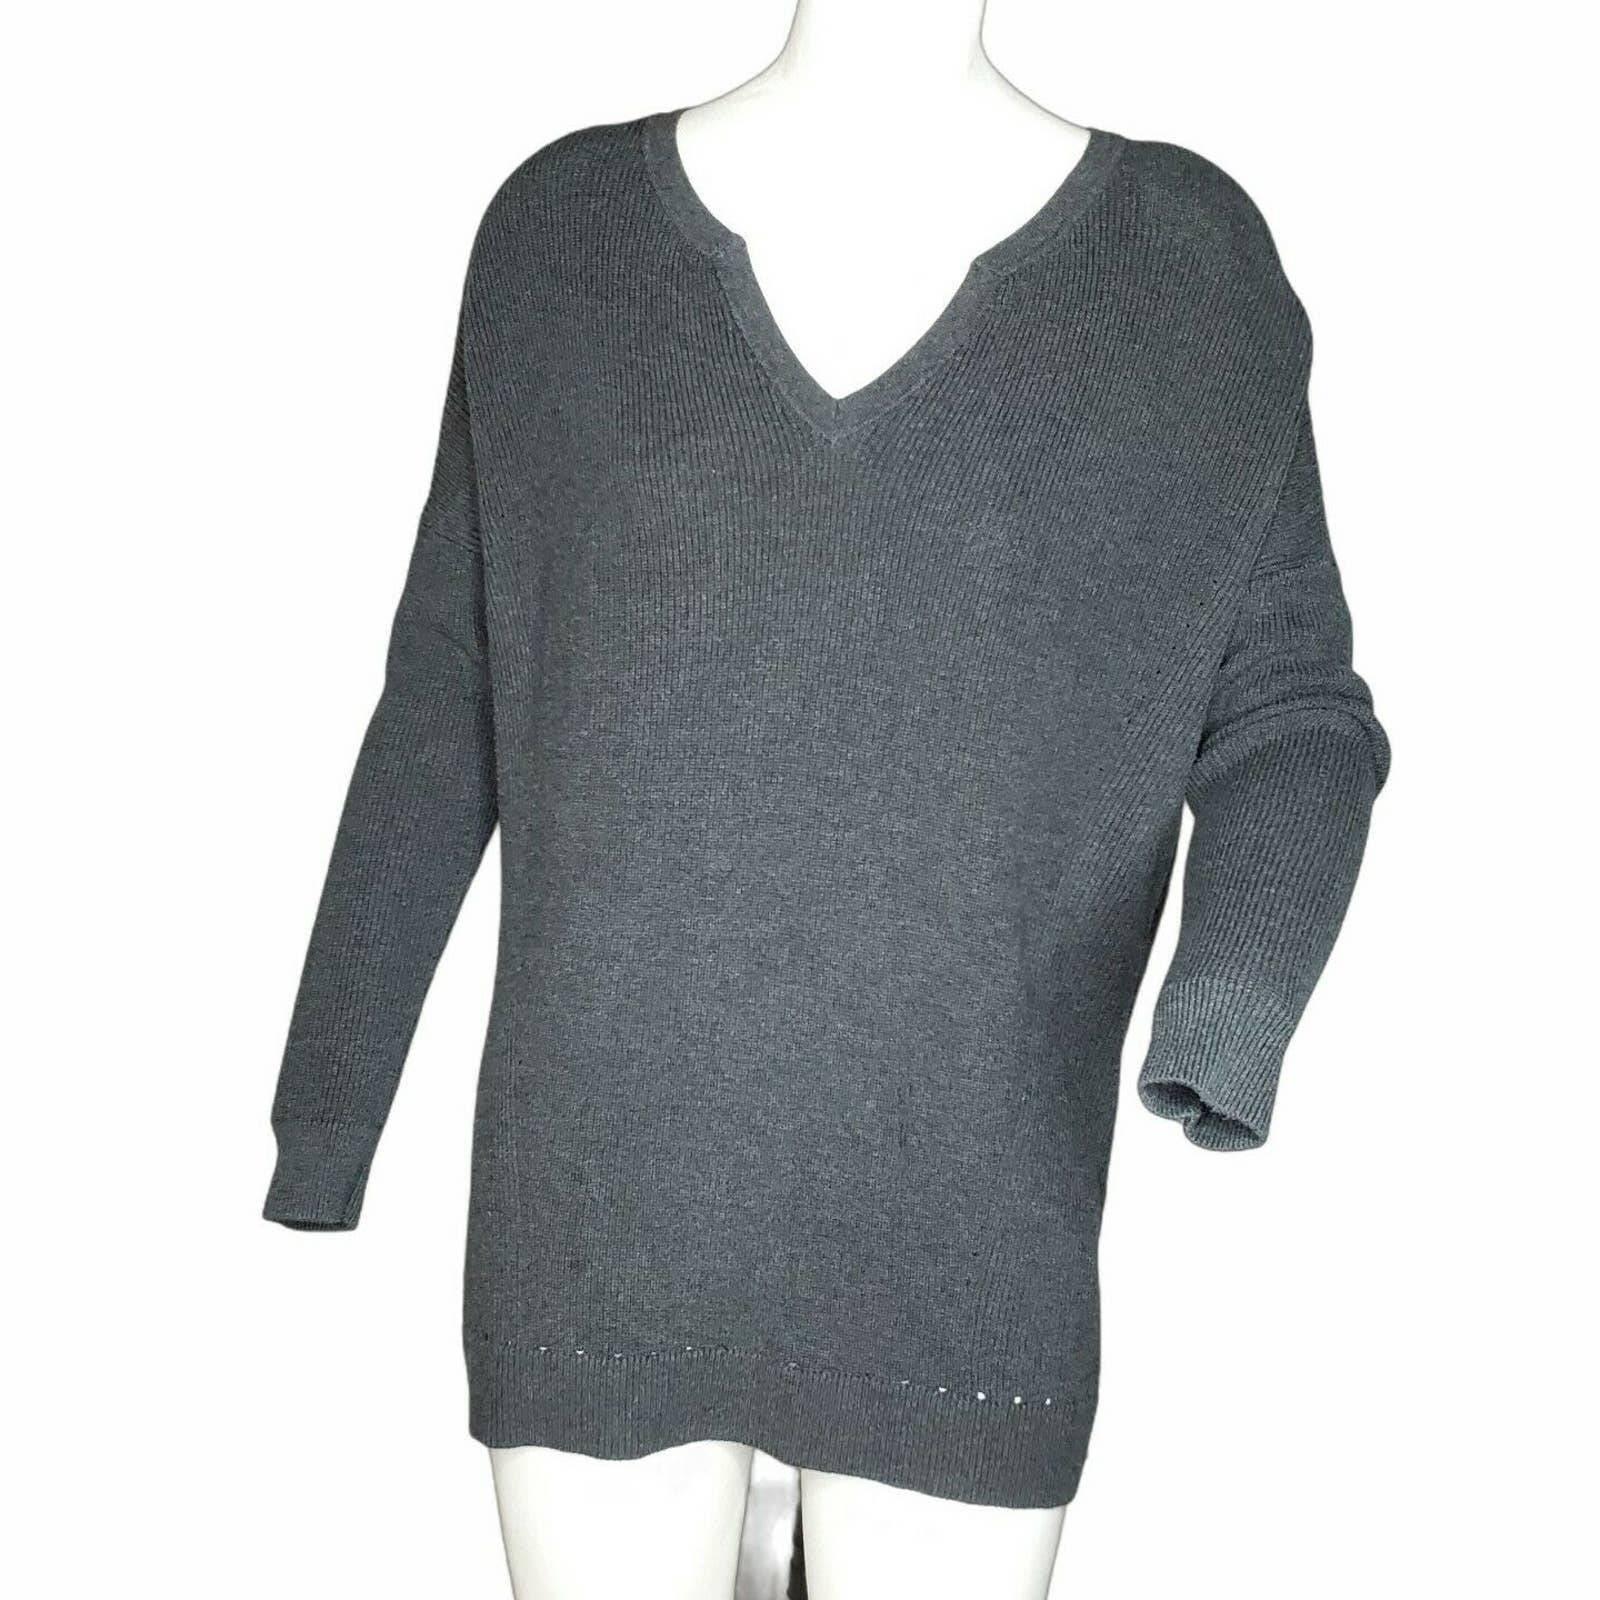 Cabi Oversized Pullover Sweater V-Neck